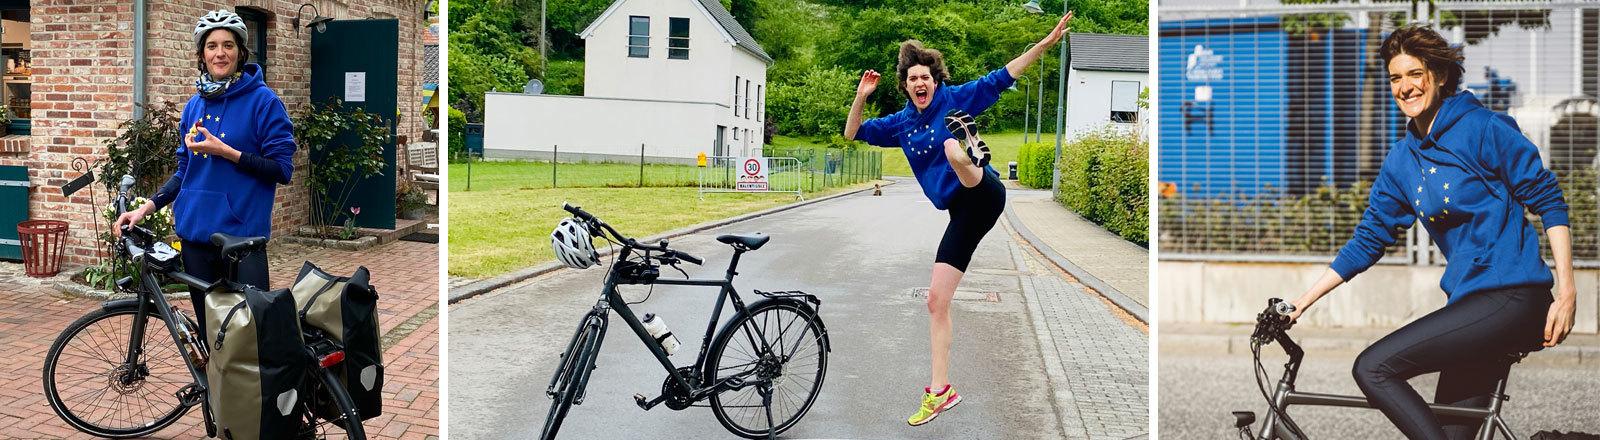 Ann van Wetteren fährt Fahrrad.